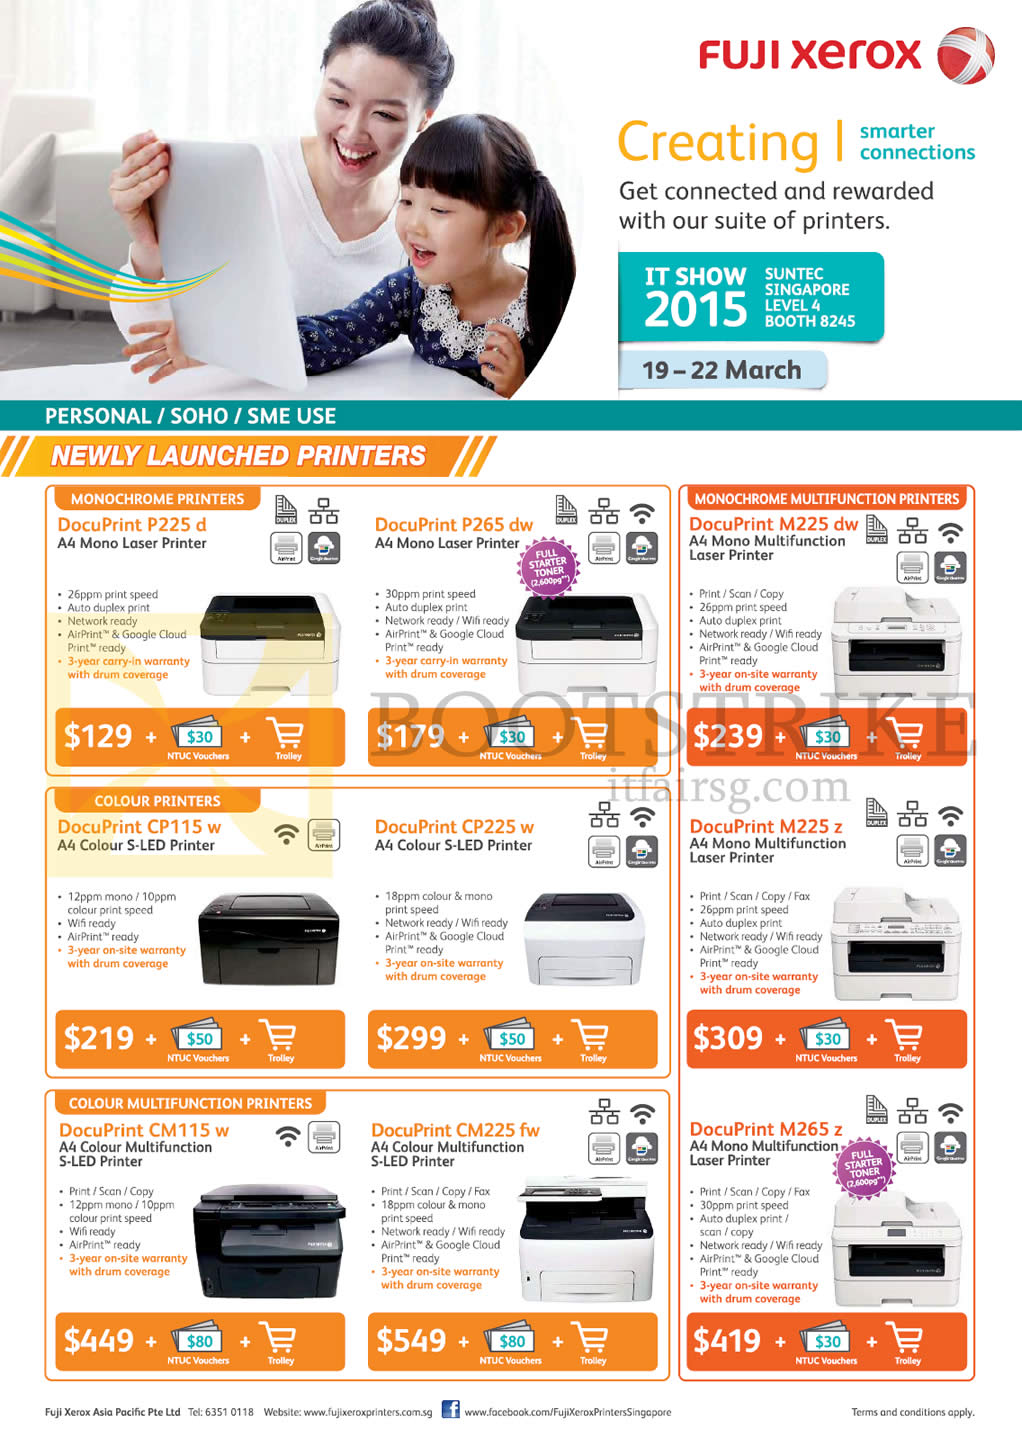 Fuji Xerox Printers Laser Docuprint P225d P265dw Cp115w Cp225w It Show 2015 Price List Image Brochure Of